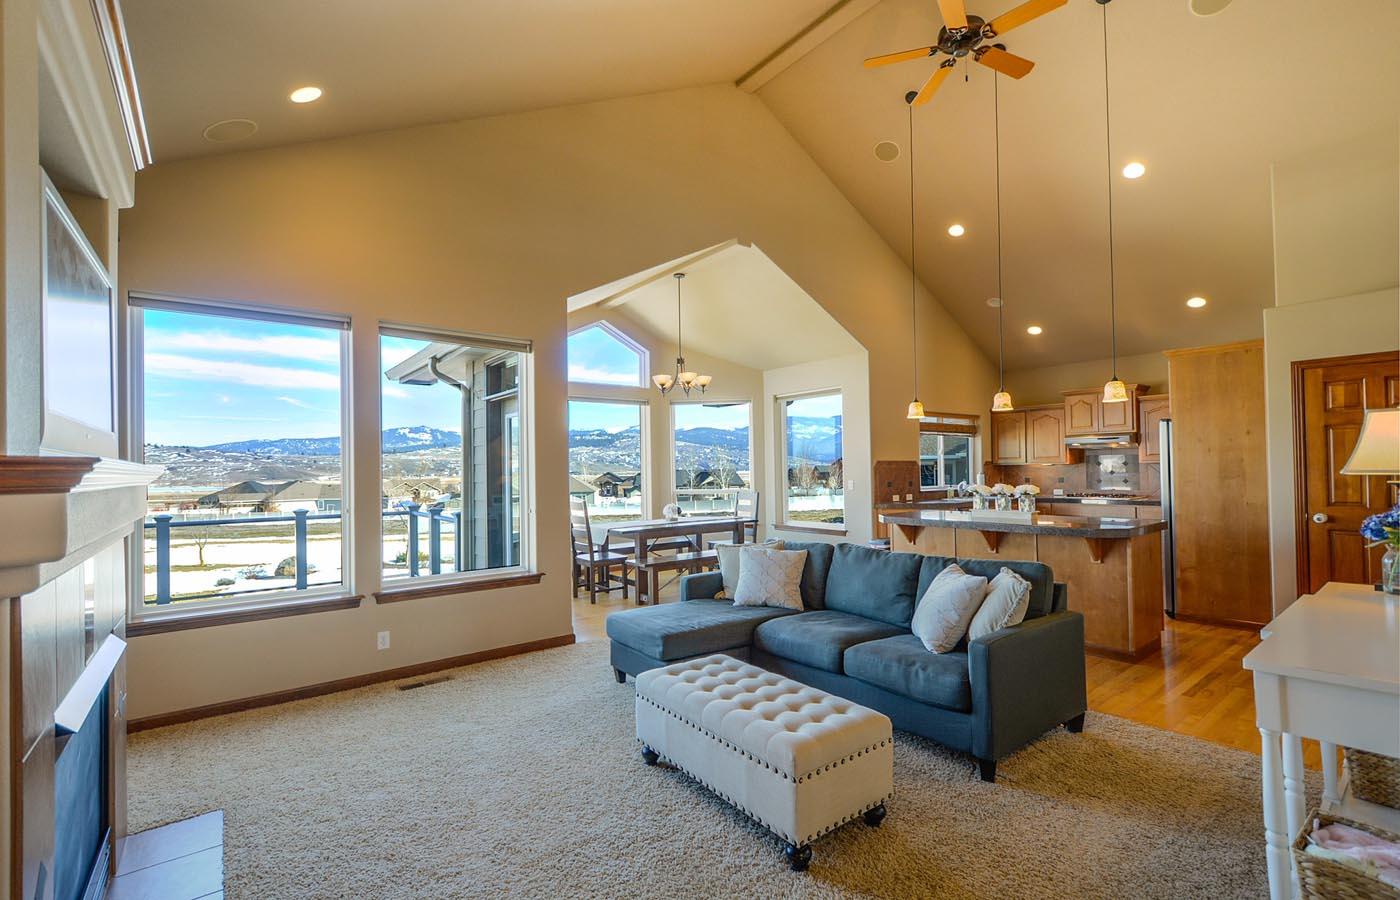 Real Estate Photography - Reno, Sparks, Carson City, Lake Tahoe, Nevada, California.